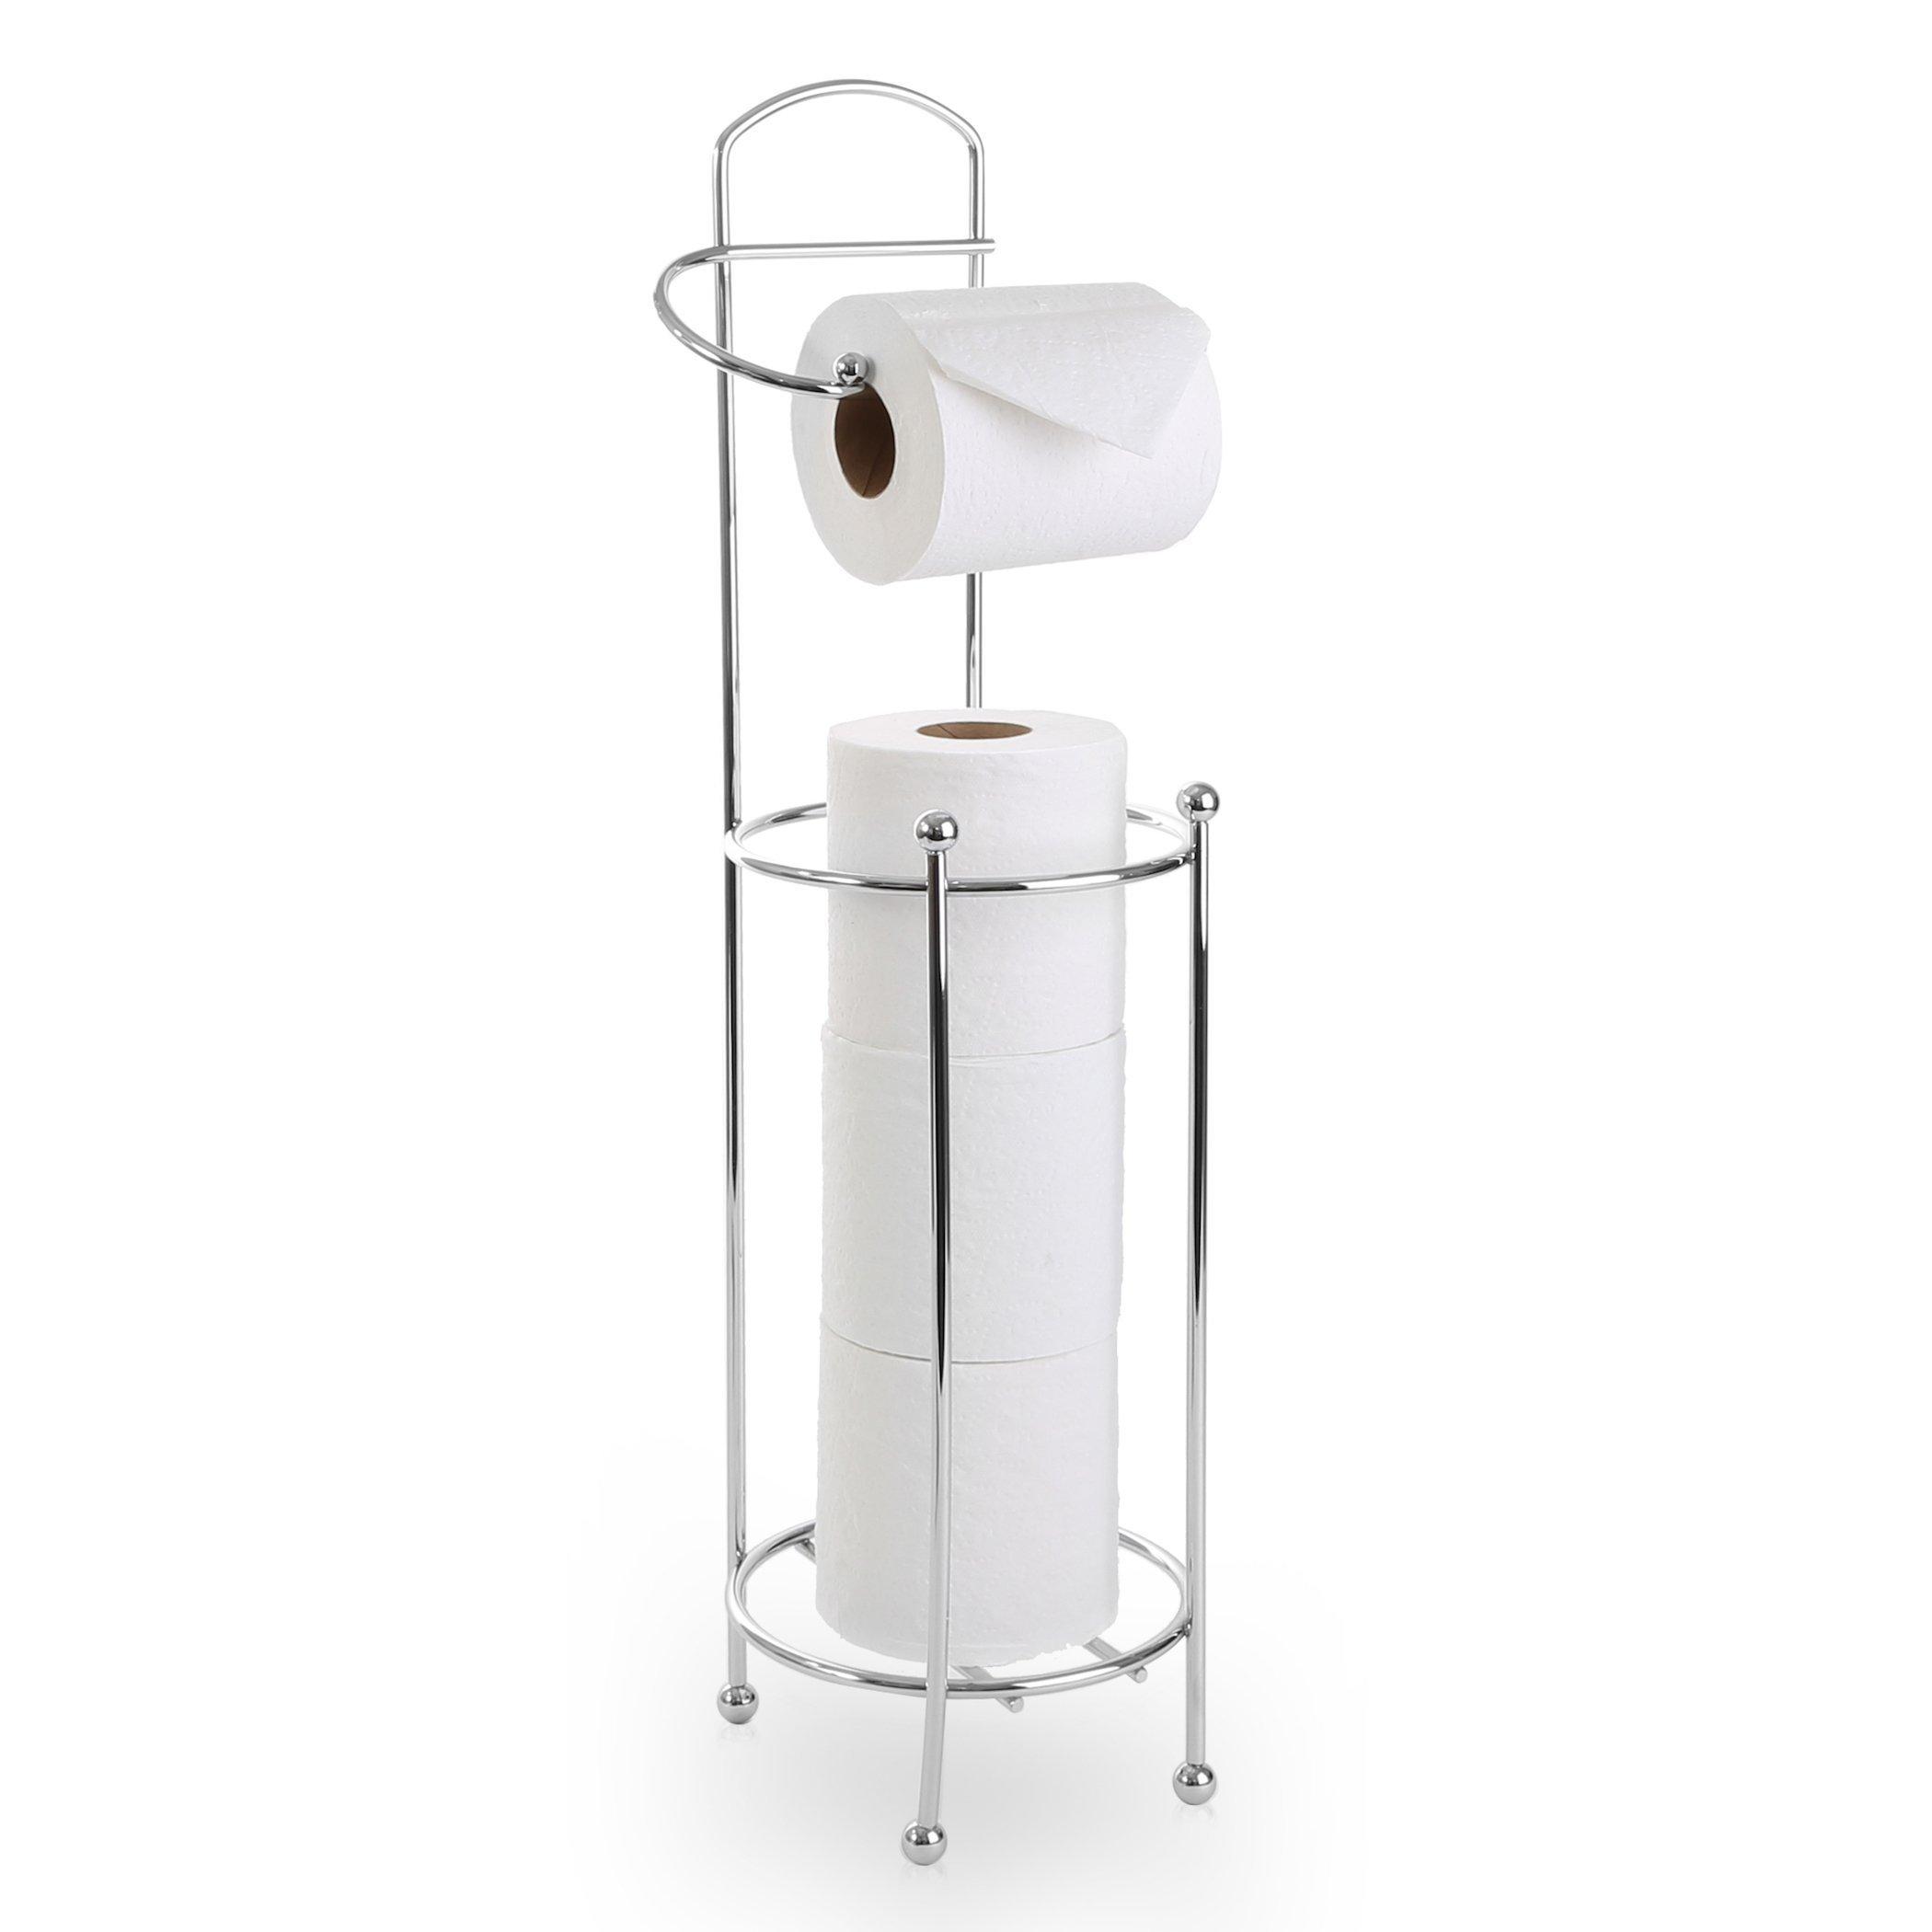 BINO 'Galaxy' Free Standing Toilet Paper Holder